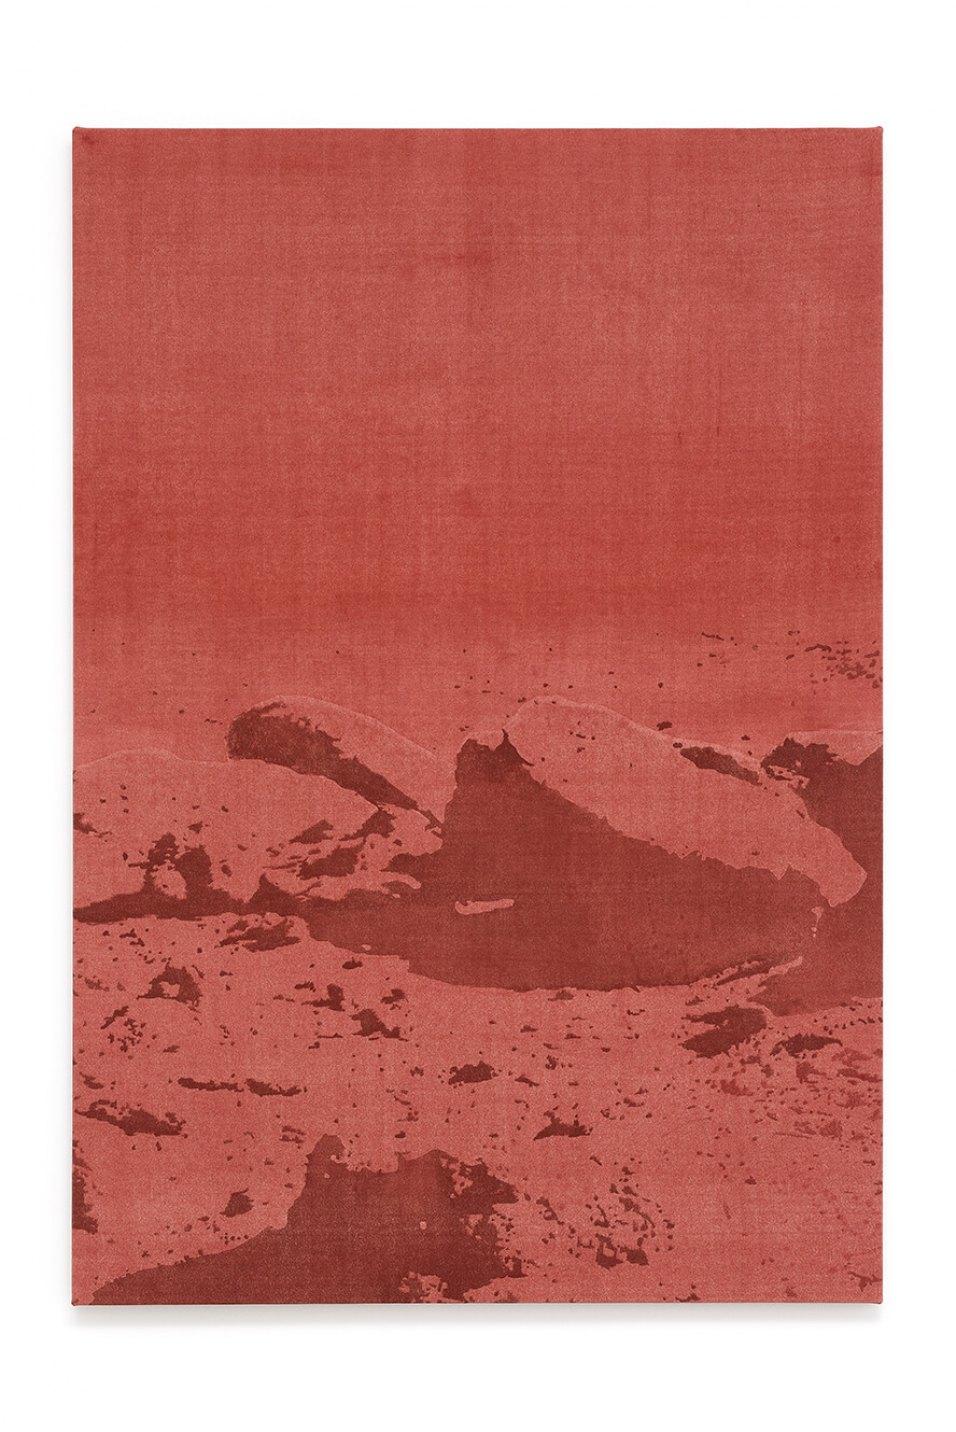 Francesco João Scavarda,<em>untitled (satellite)</em>,2017,gouache on raw canvas,145 × 100 × 4 cm - Mendes Wood DM